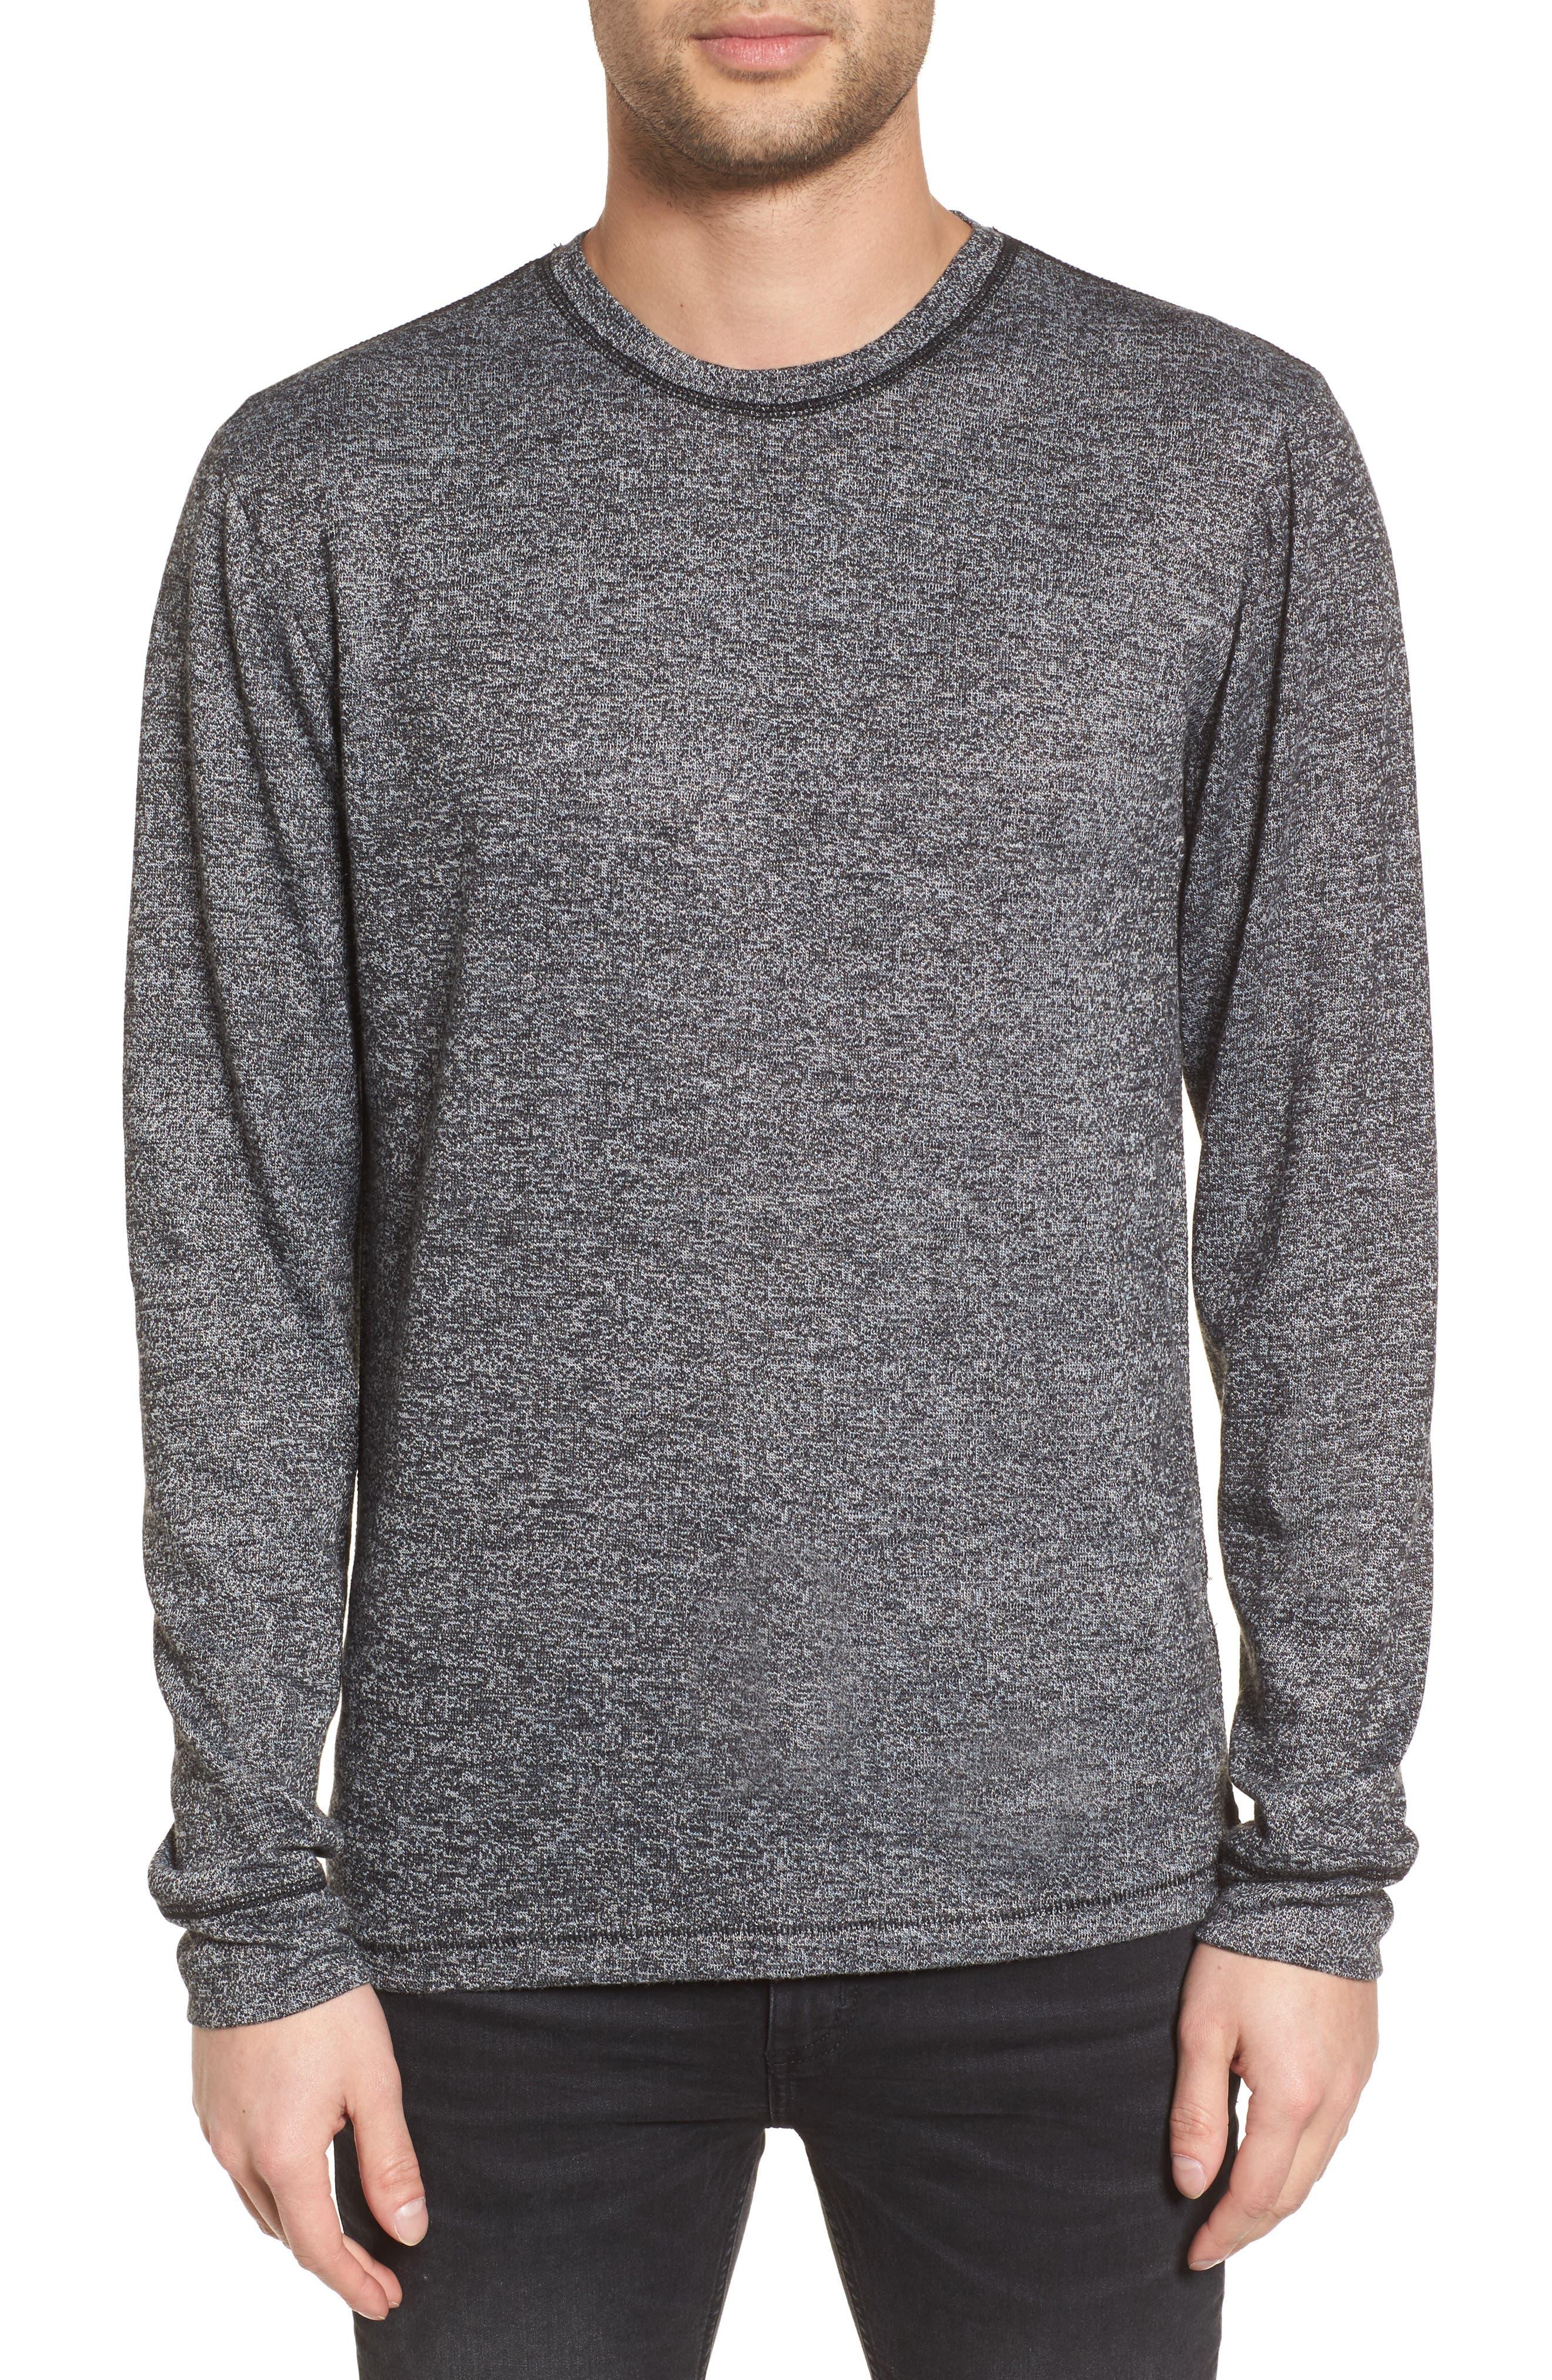 Main Image - Treasure&Bond Crewneck Sweater